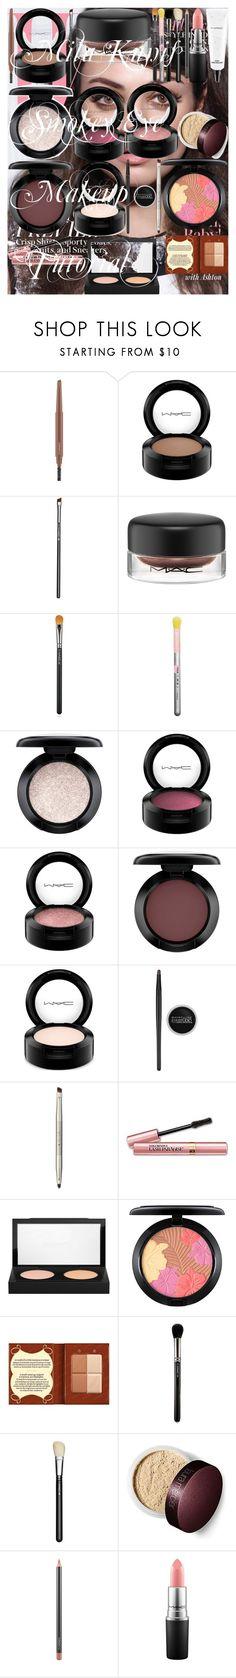 """Mila Kunis Smokey Eye Makeup Tutorial"" by oroartye-1 on Polyvore featuring beauty, MAC Cosmetics, Maybelline, Ilia, L'Oréal Paris and Bourjois"